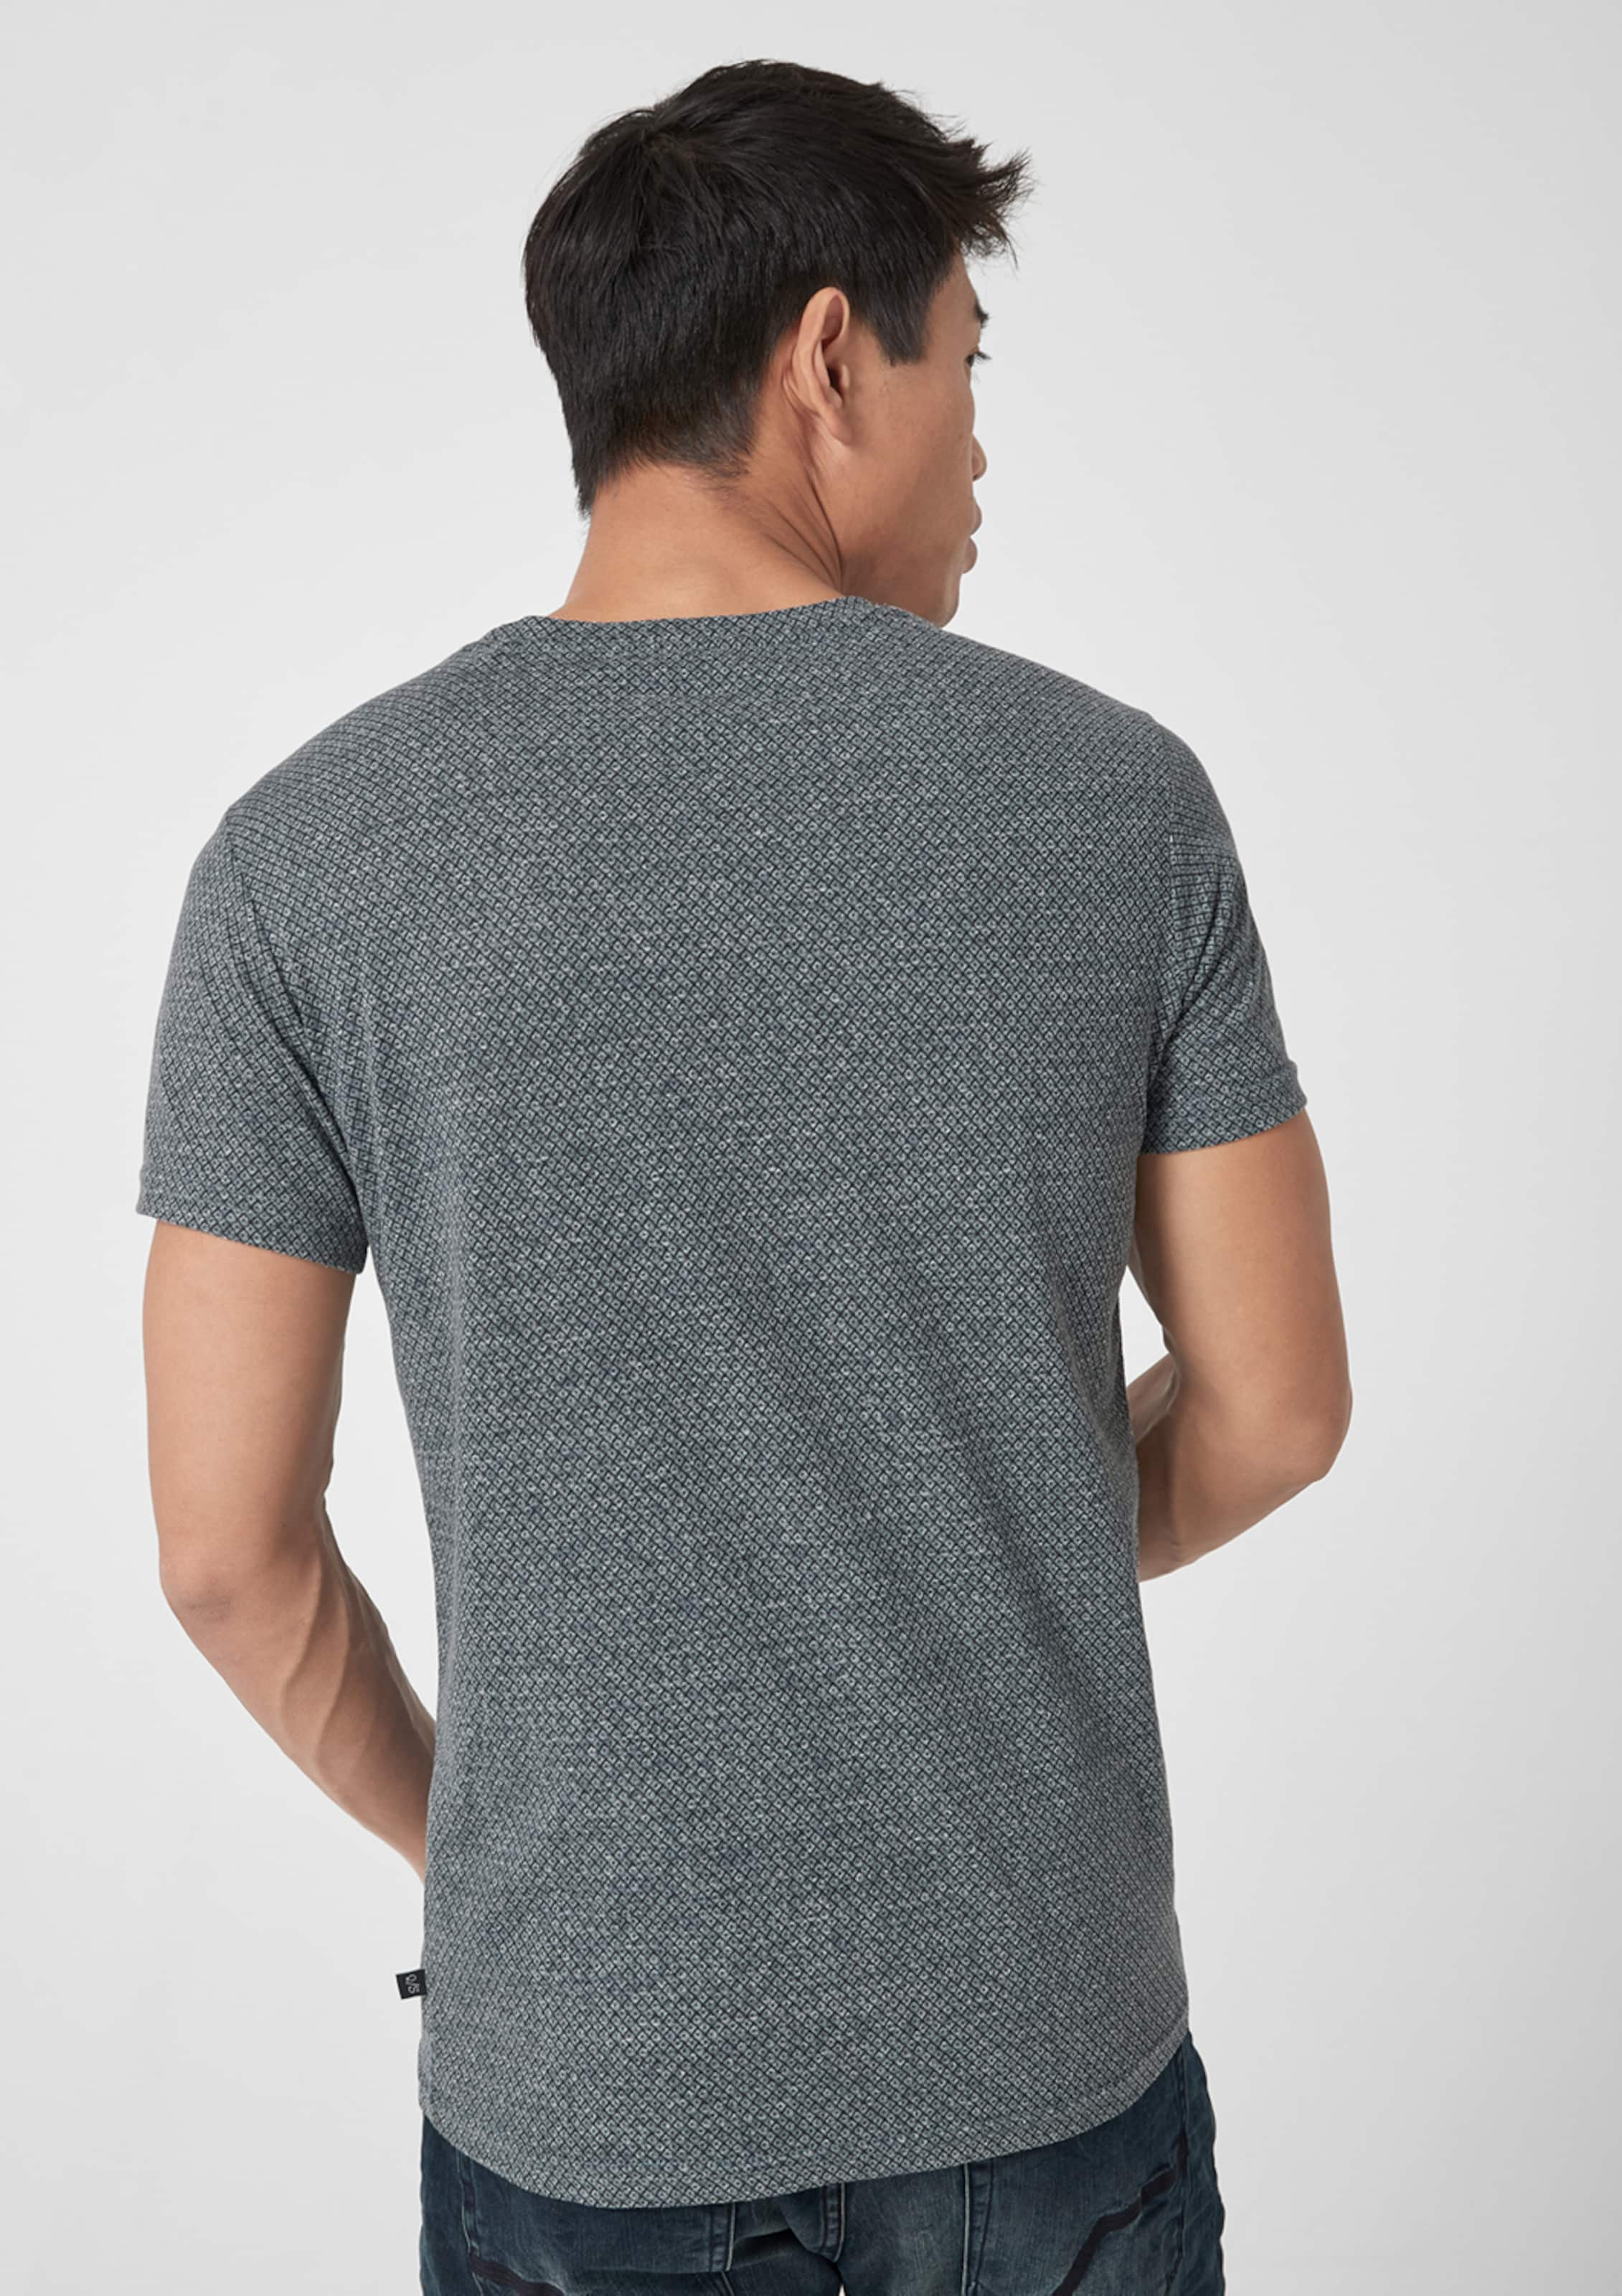 shirt Rauchgrau s By In Designed Q T rCdxWoQeBE